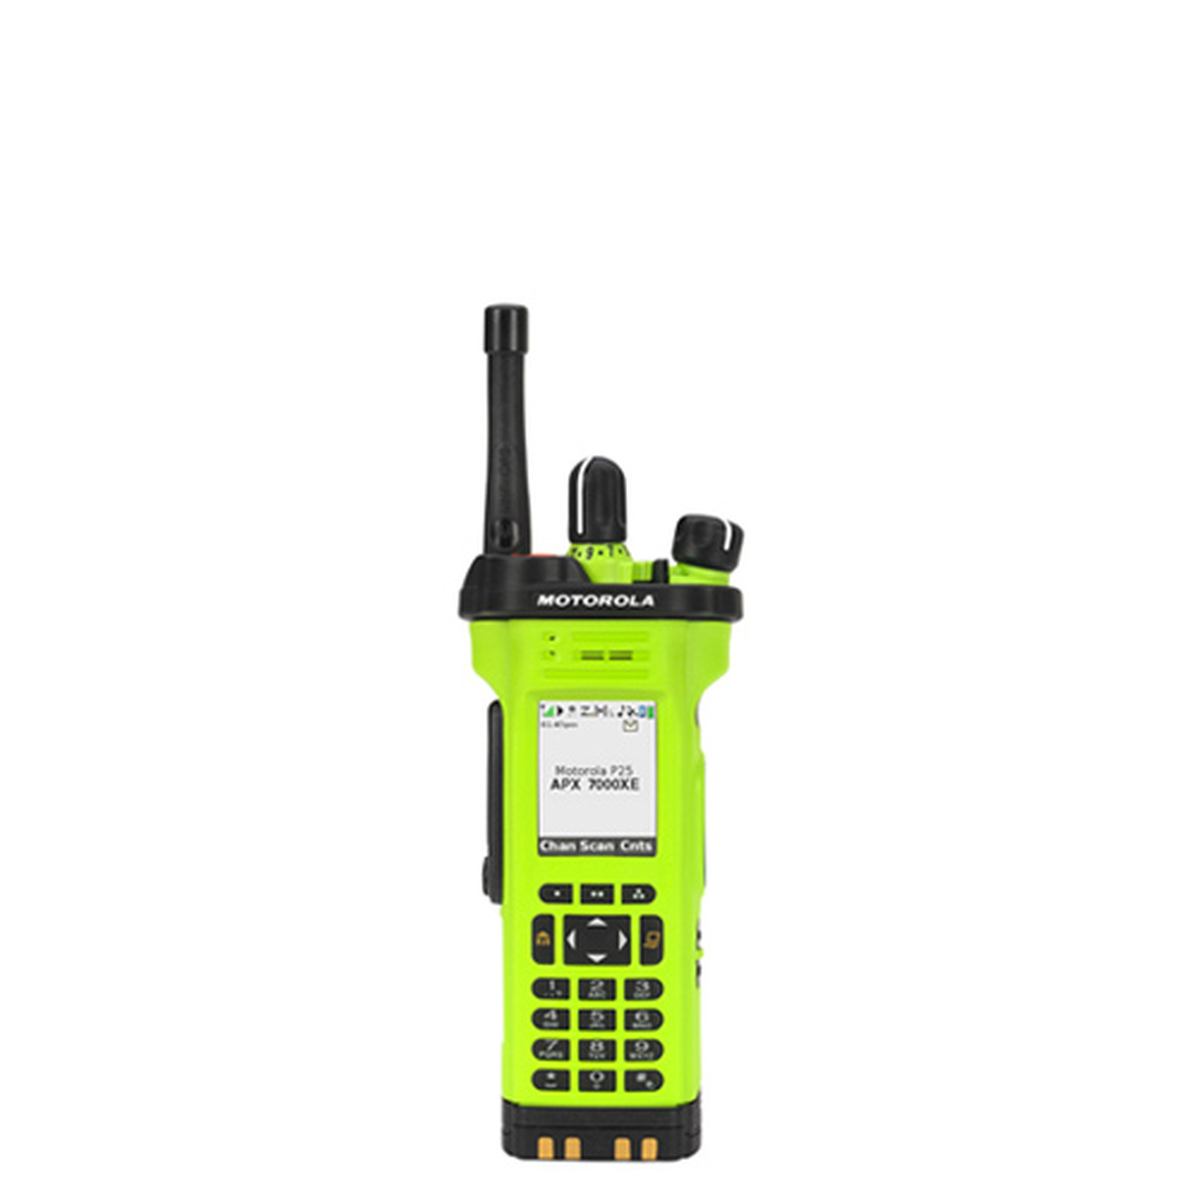 Radio Motorola APX 7000XE P25 Digital